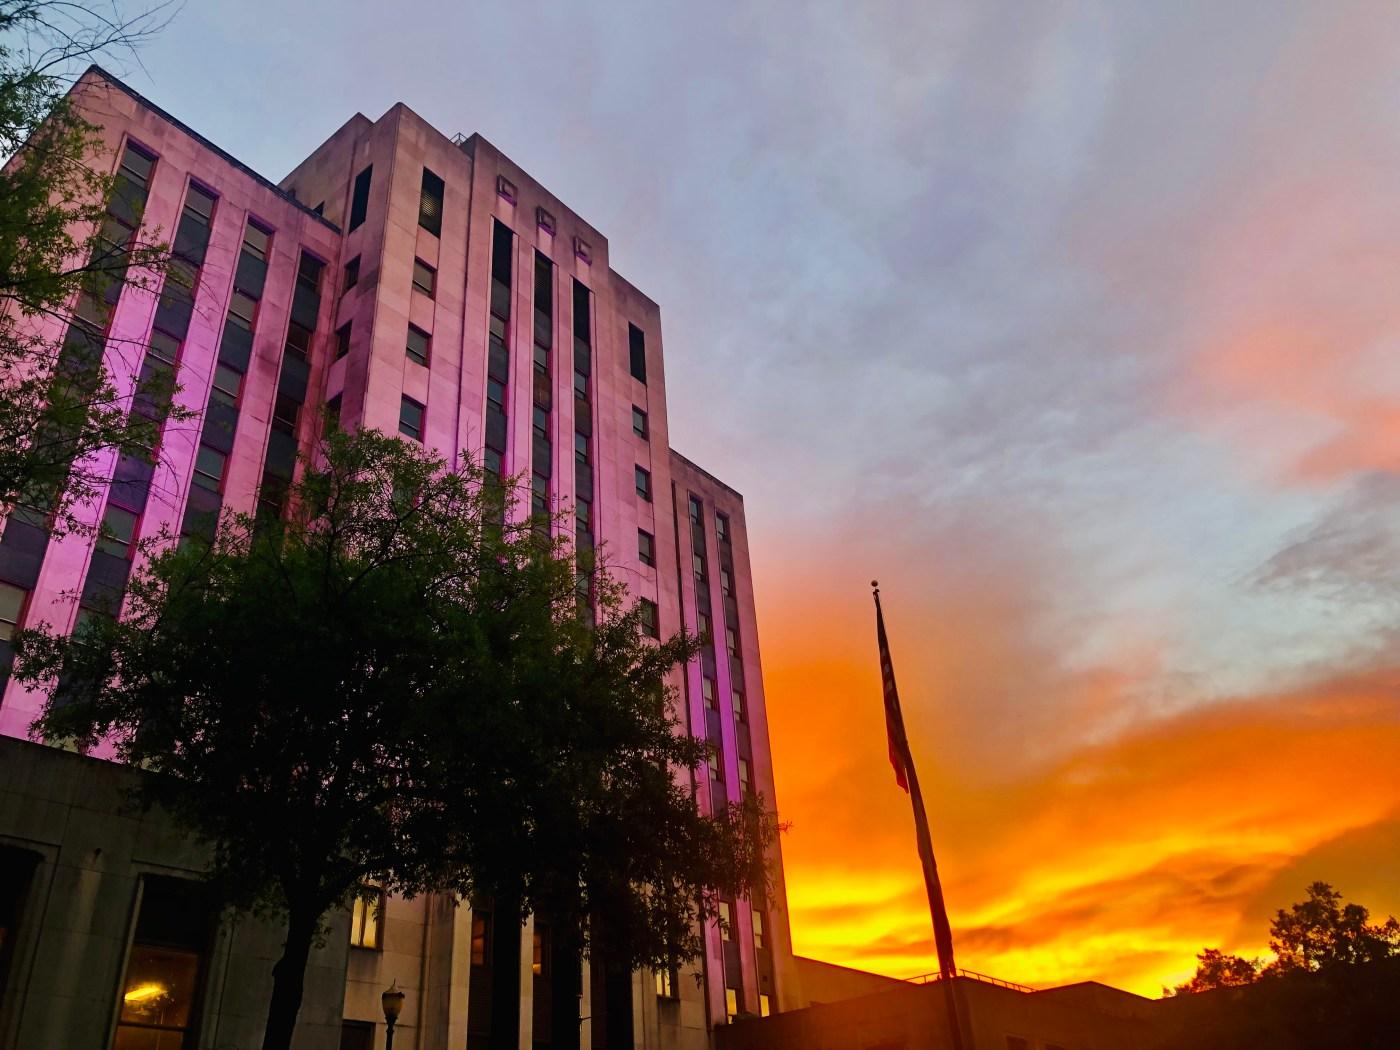 Birmingham City Hall at Sunset 2021